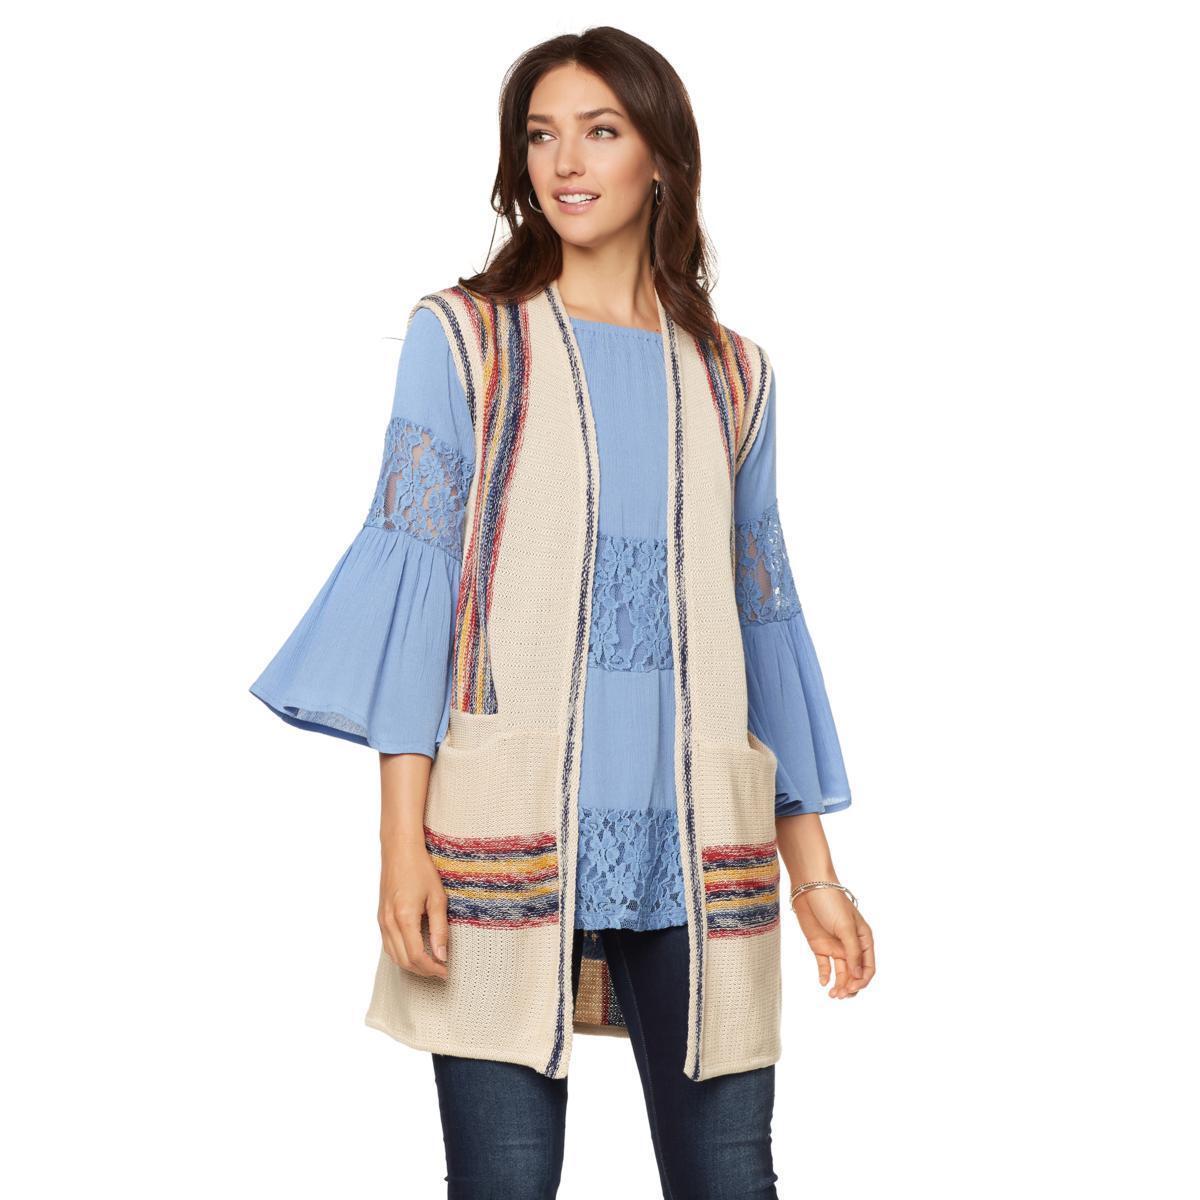 Curations Caravan Sweater Knit Vest in Oatmeal, XS (HSN )